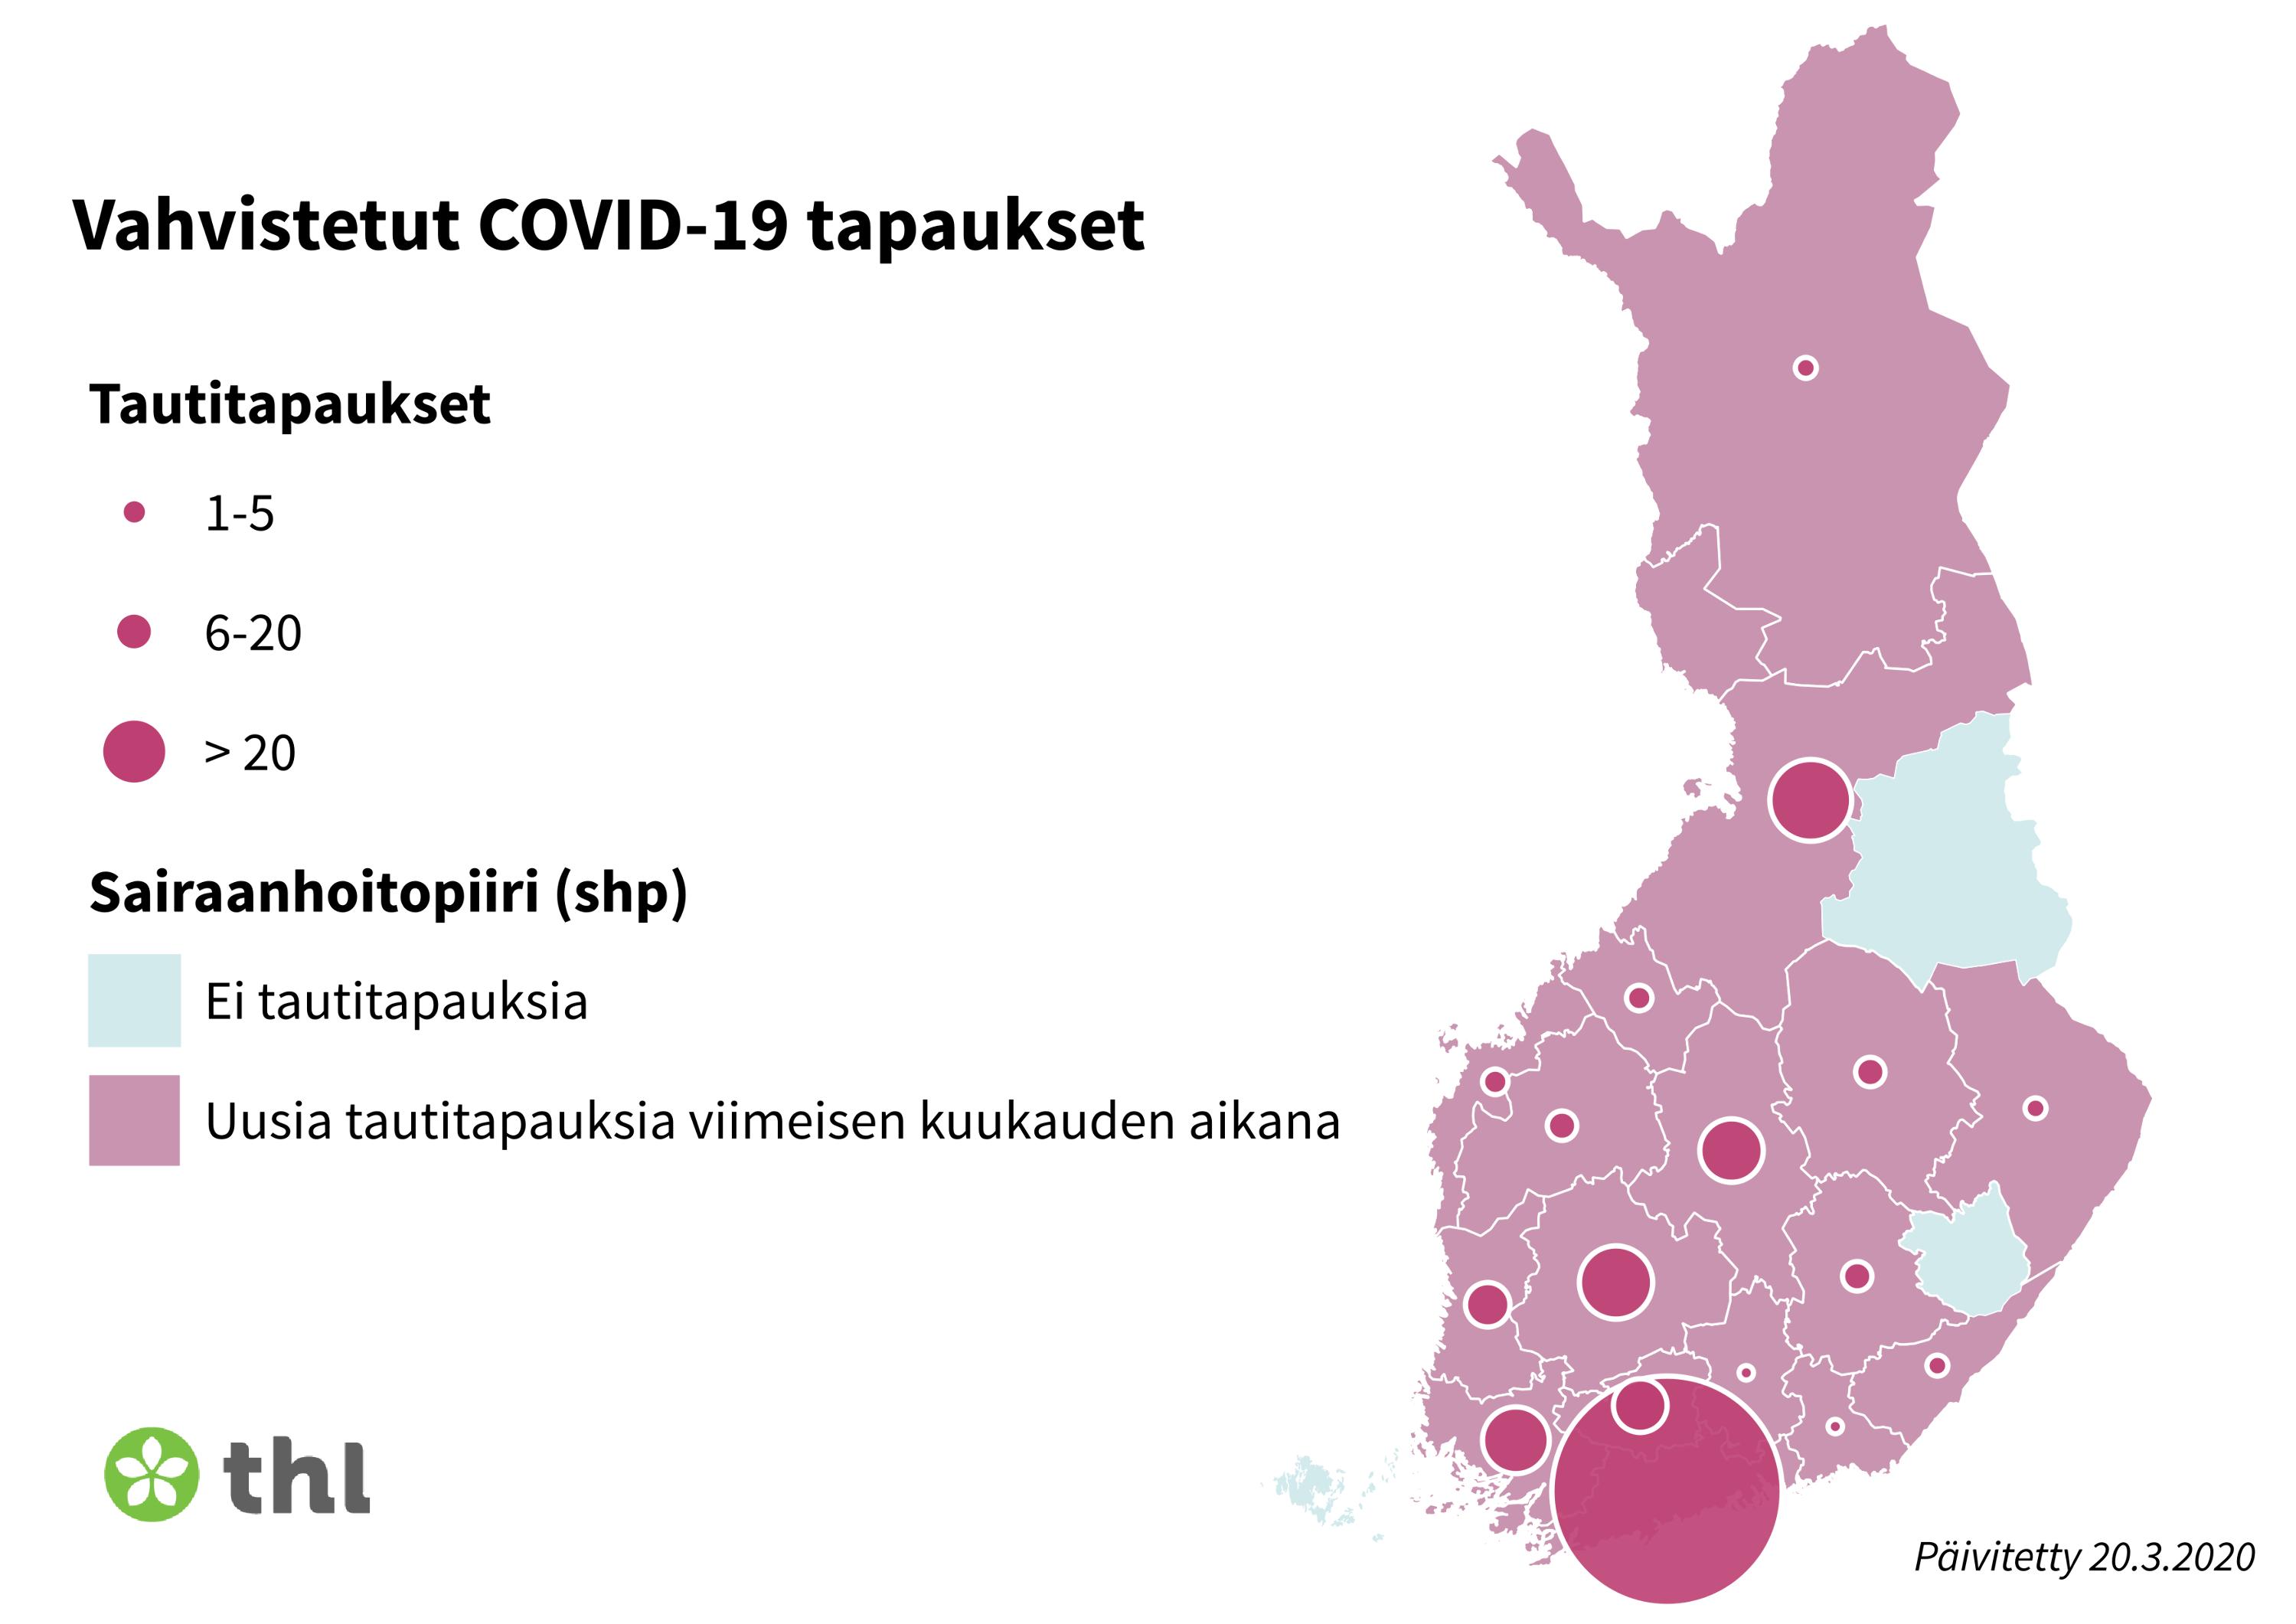 Случаи заболевания коронавирусом по регионам